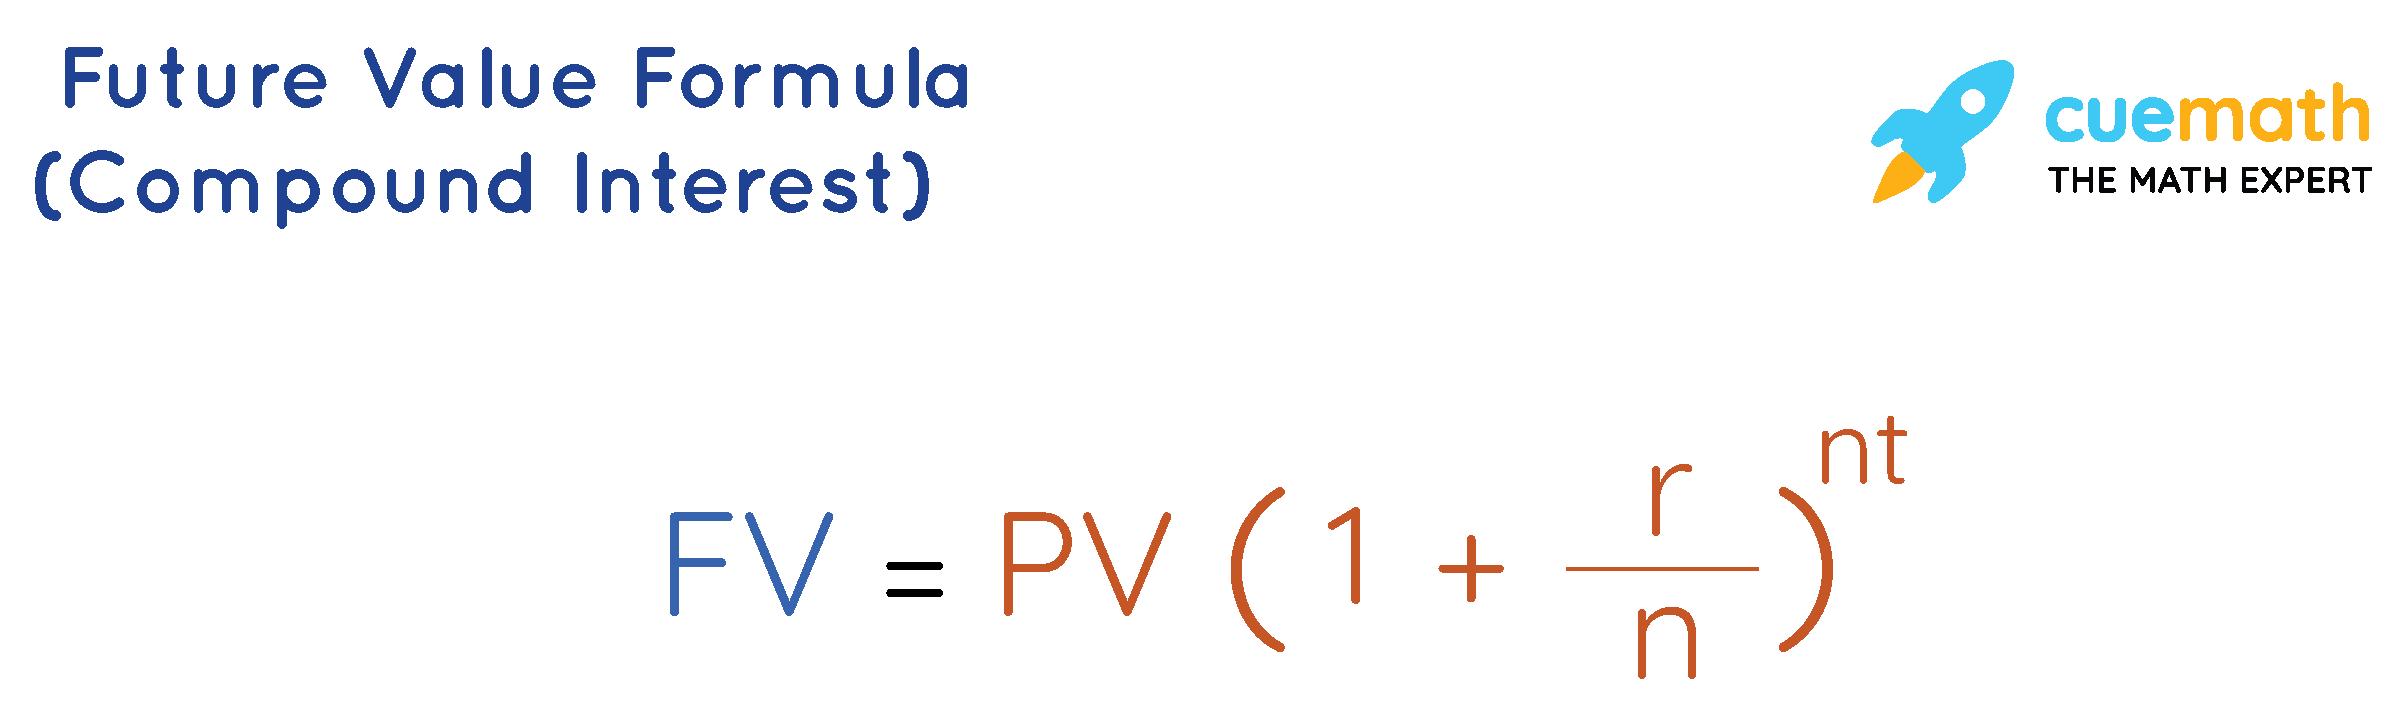 future value formula of compound interest, FV = PV ( 1+r/n)^nt